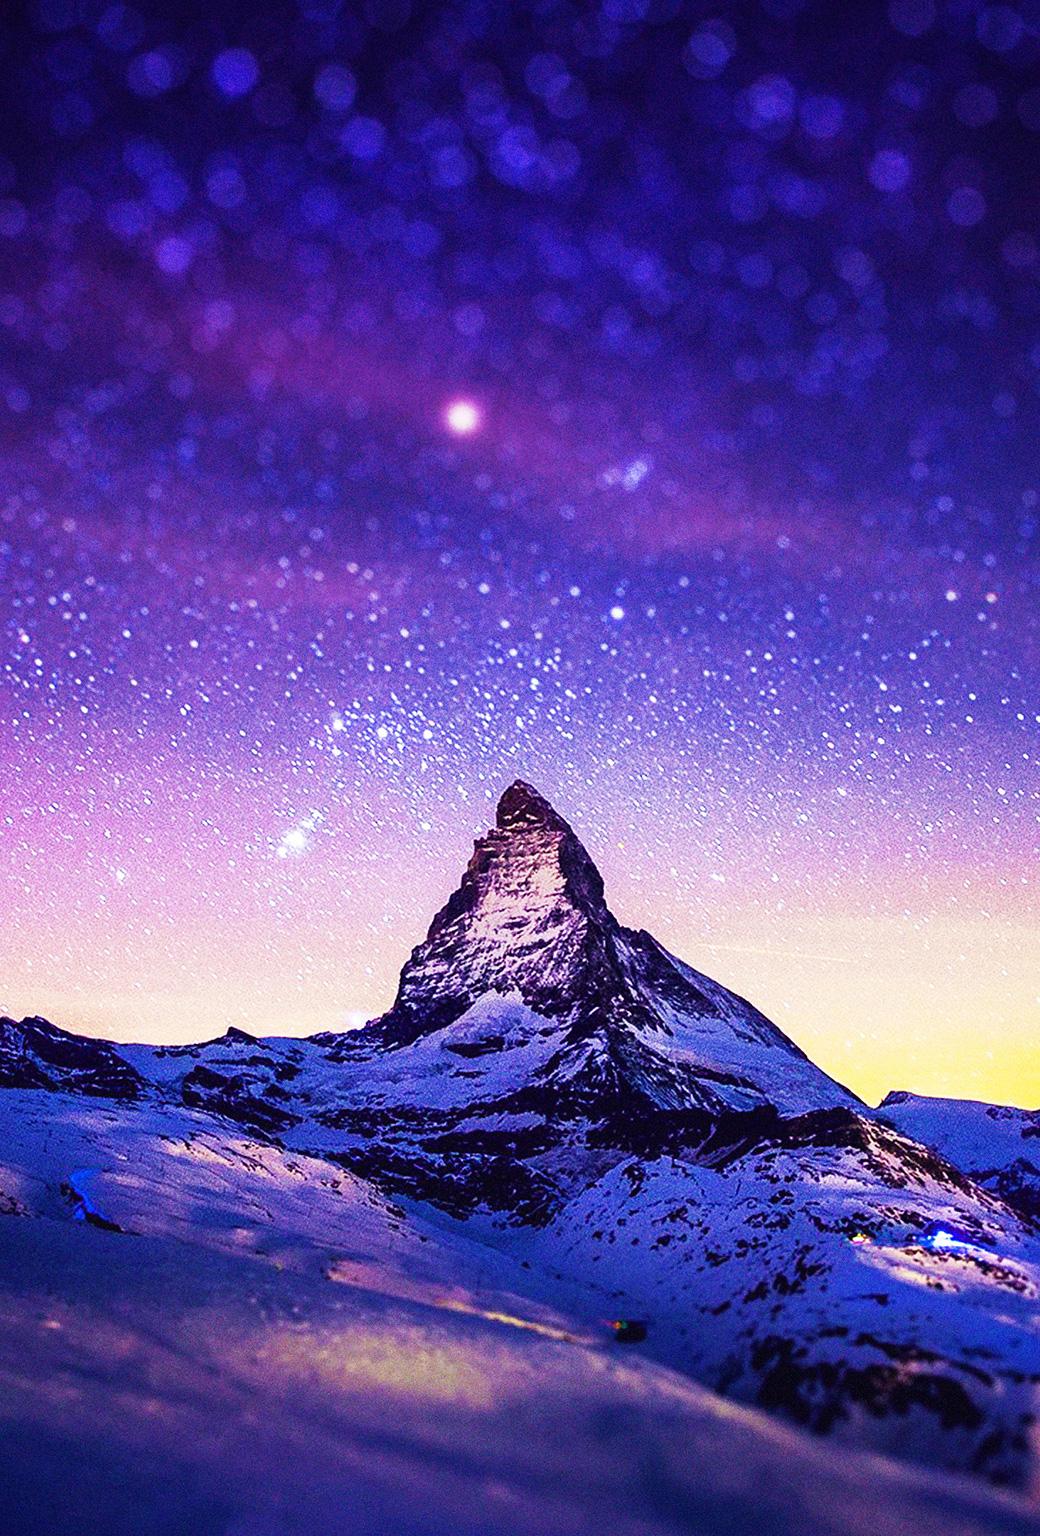 Snow Mountain 3Wallpapers iphone Parallax Snow Mountain